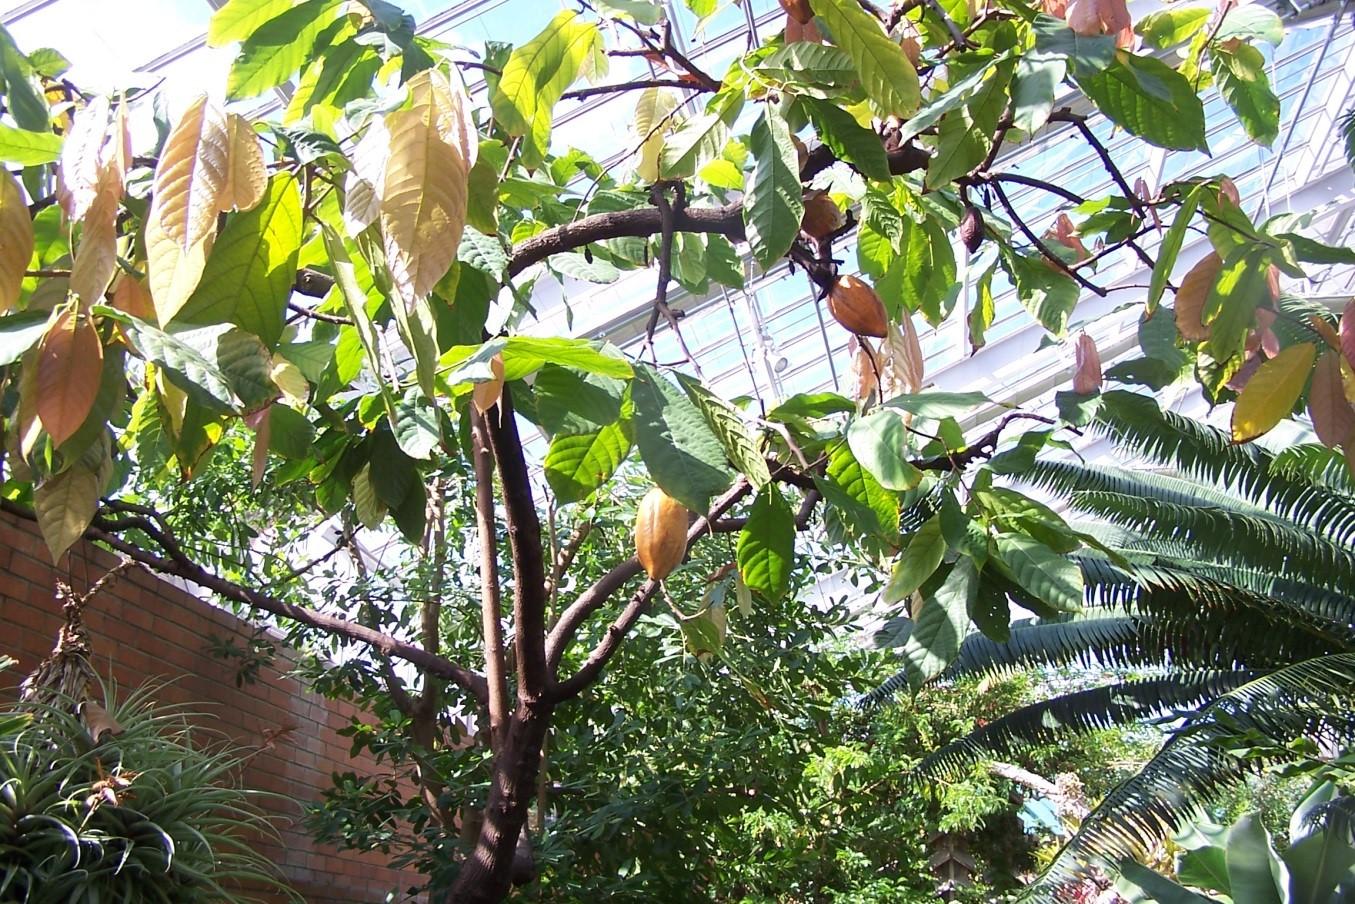 Cacao tree at Matthaei